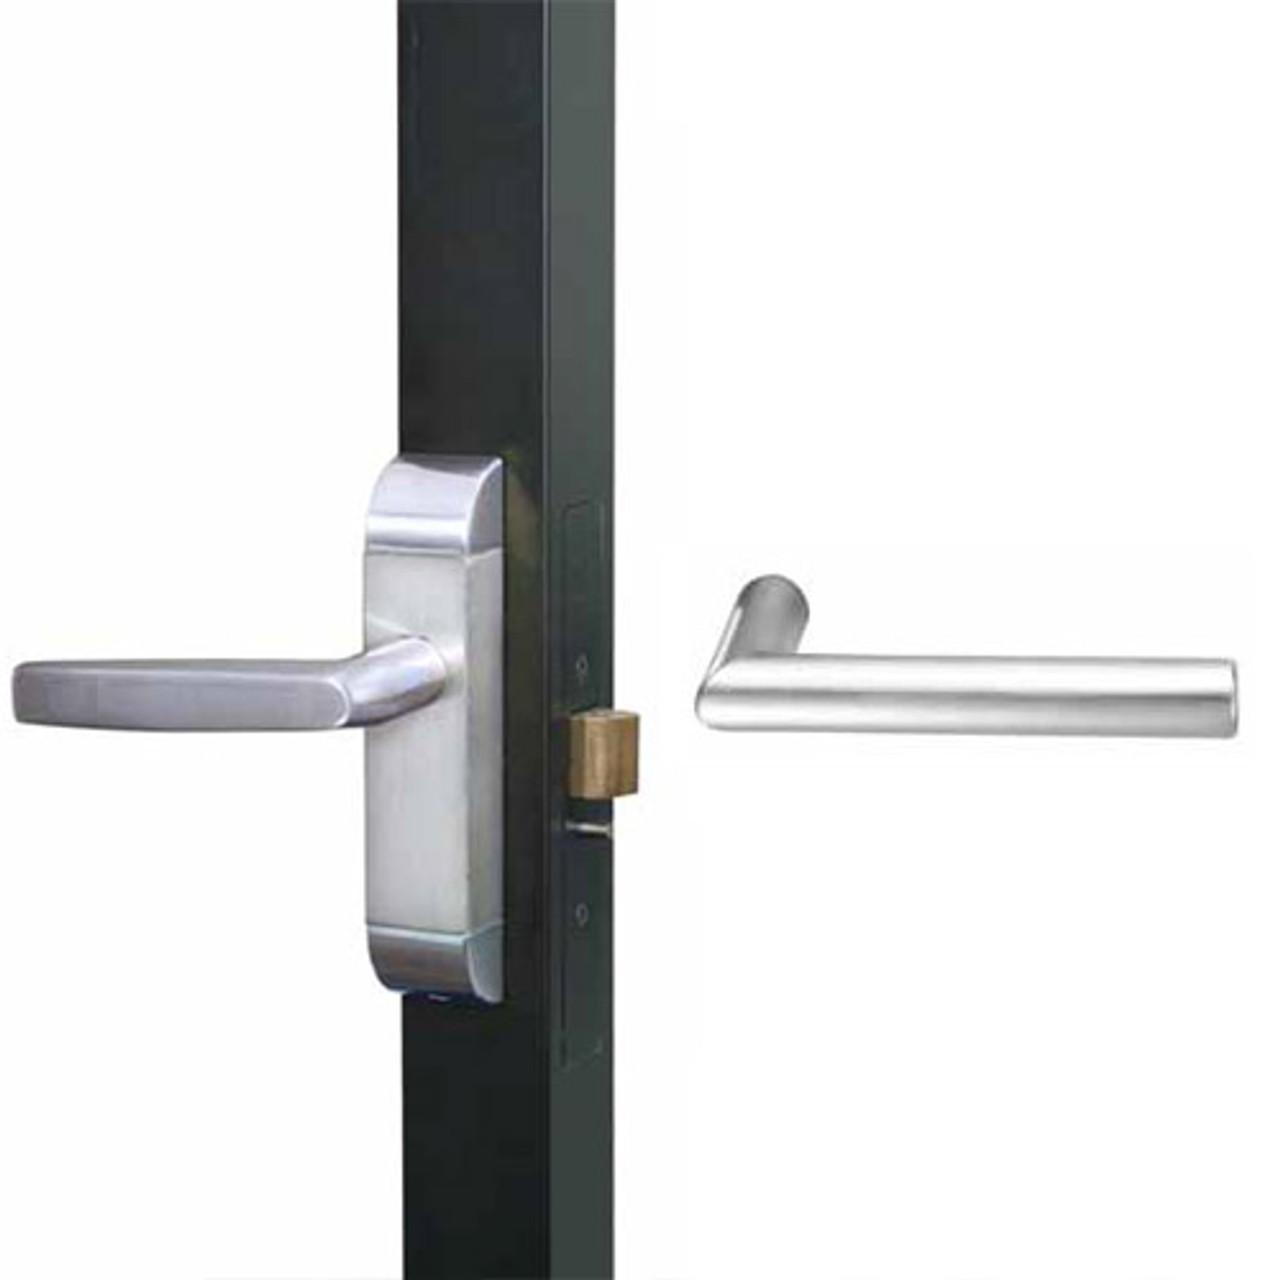 4600M-MI-622-US32 Adams Rite MI Designer Deadlatch handle in Bright Stainless Finish